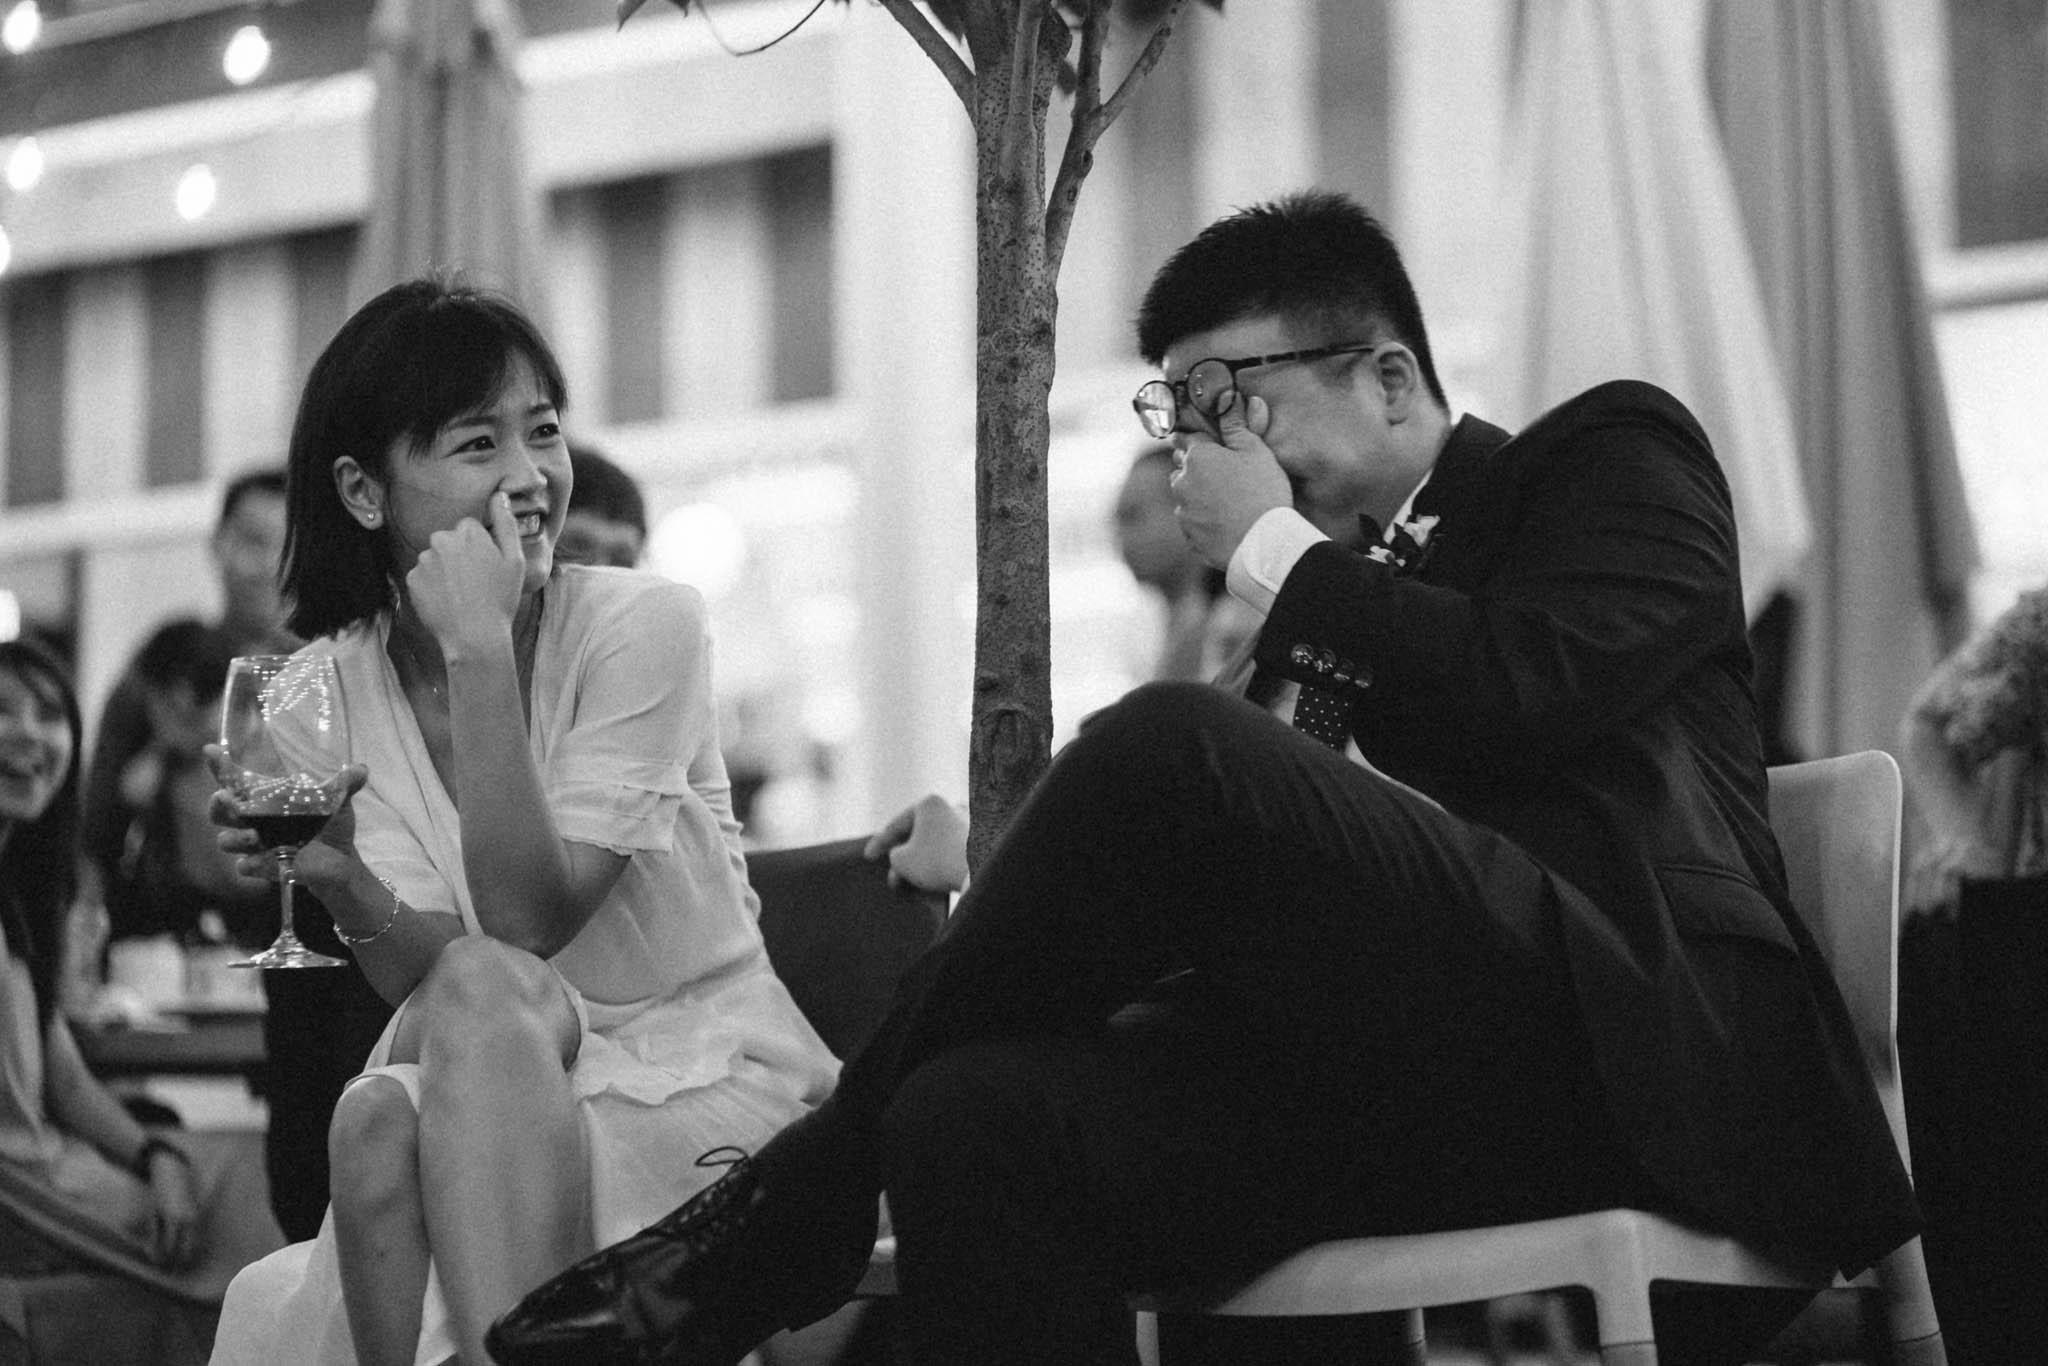 singapore-wedding-photographer-sentosa-foc-mark-eleanor-58.jpg